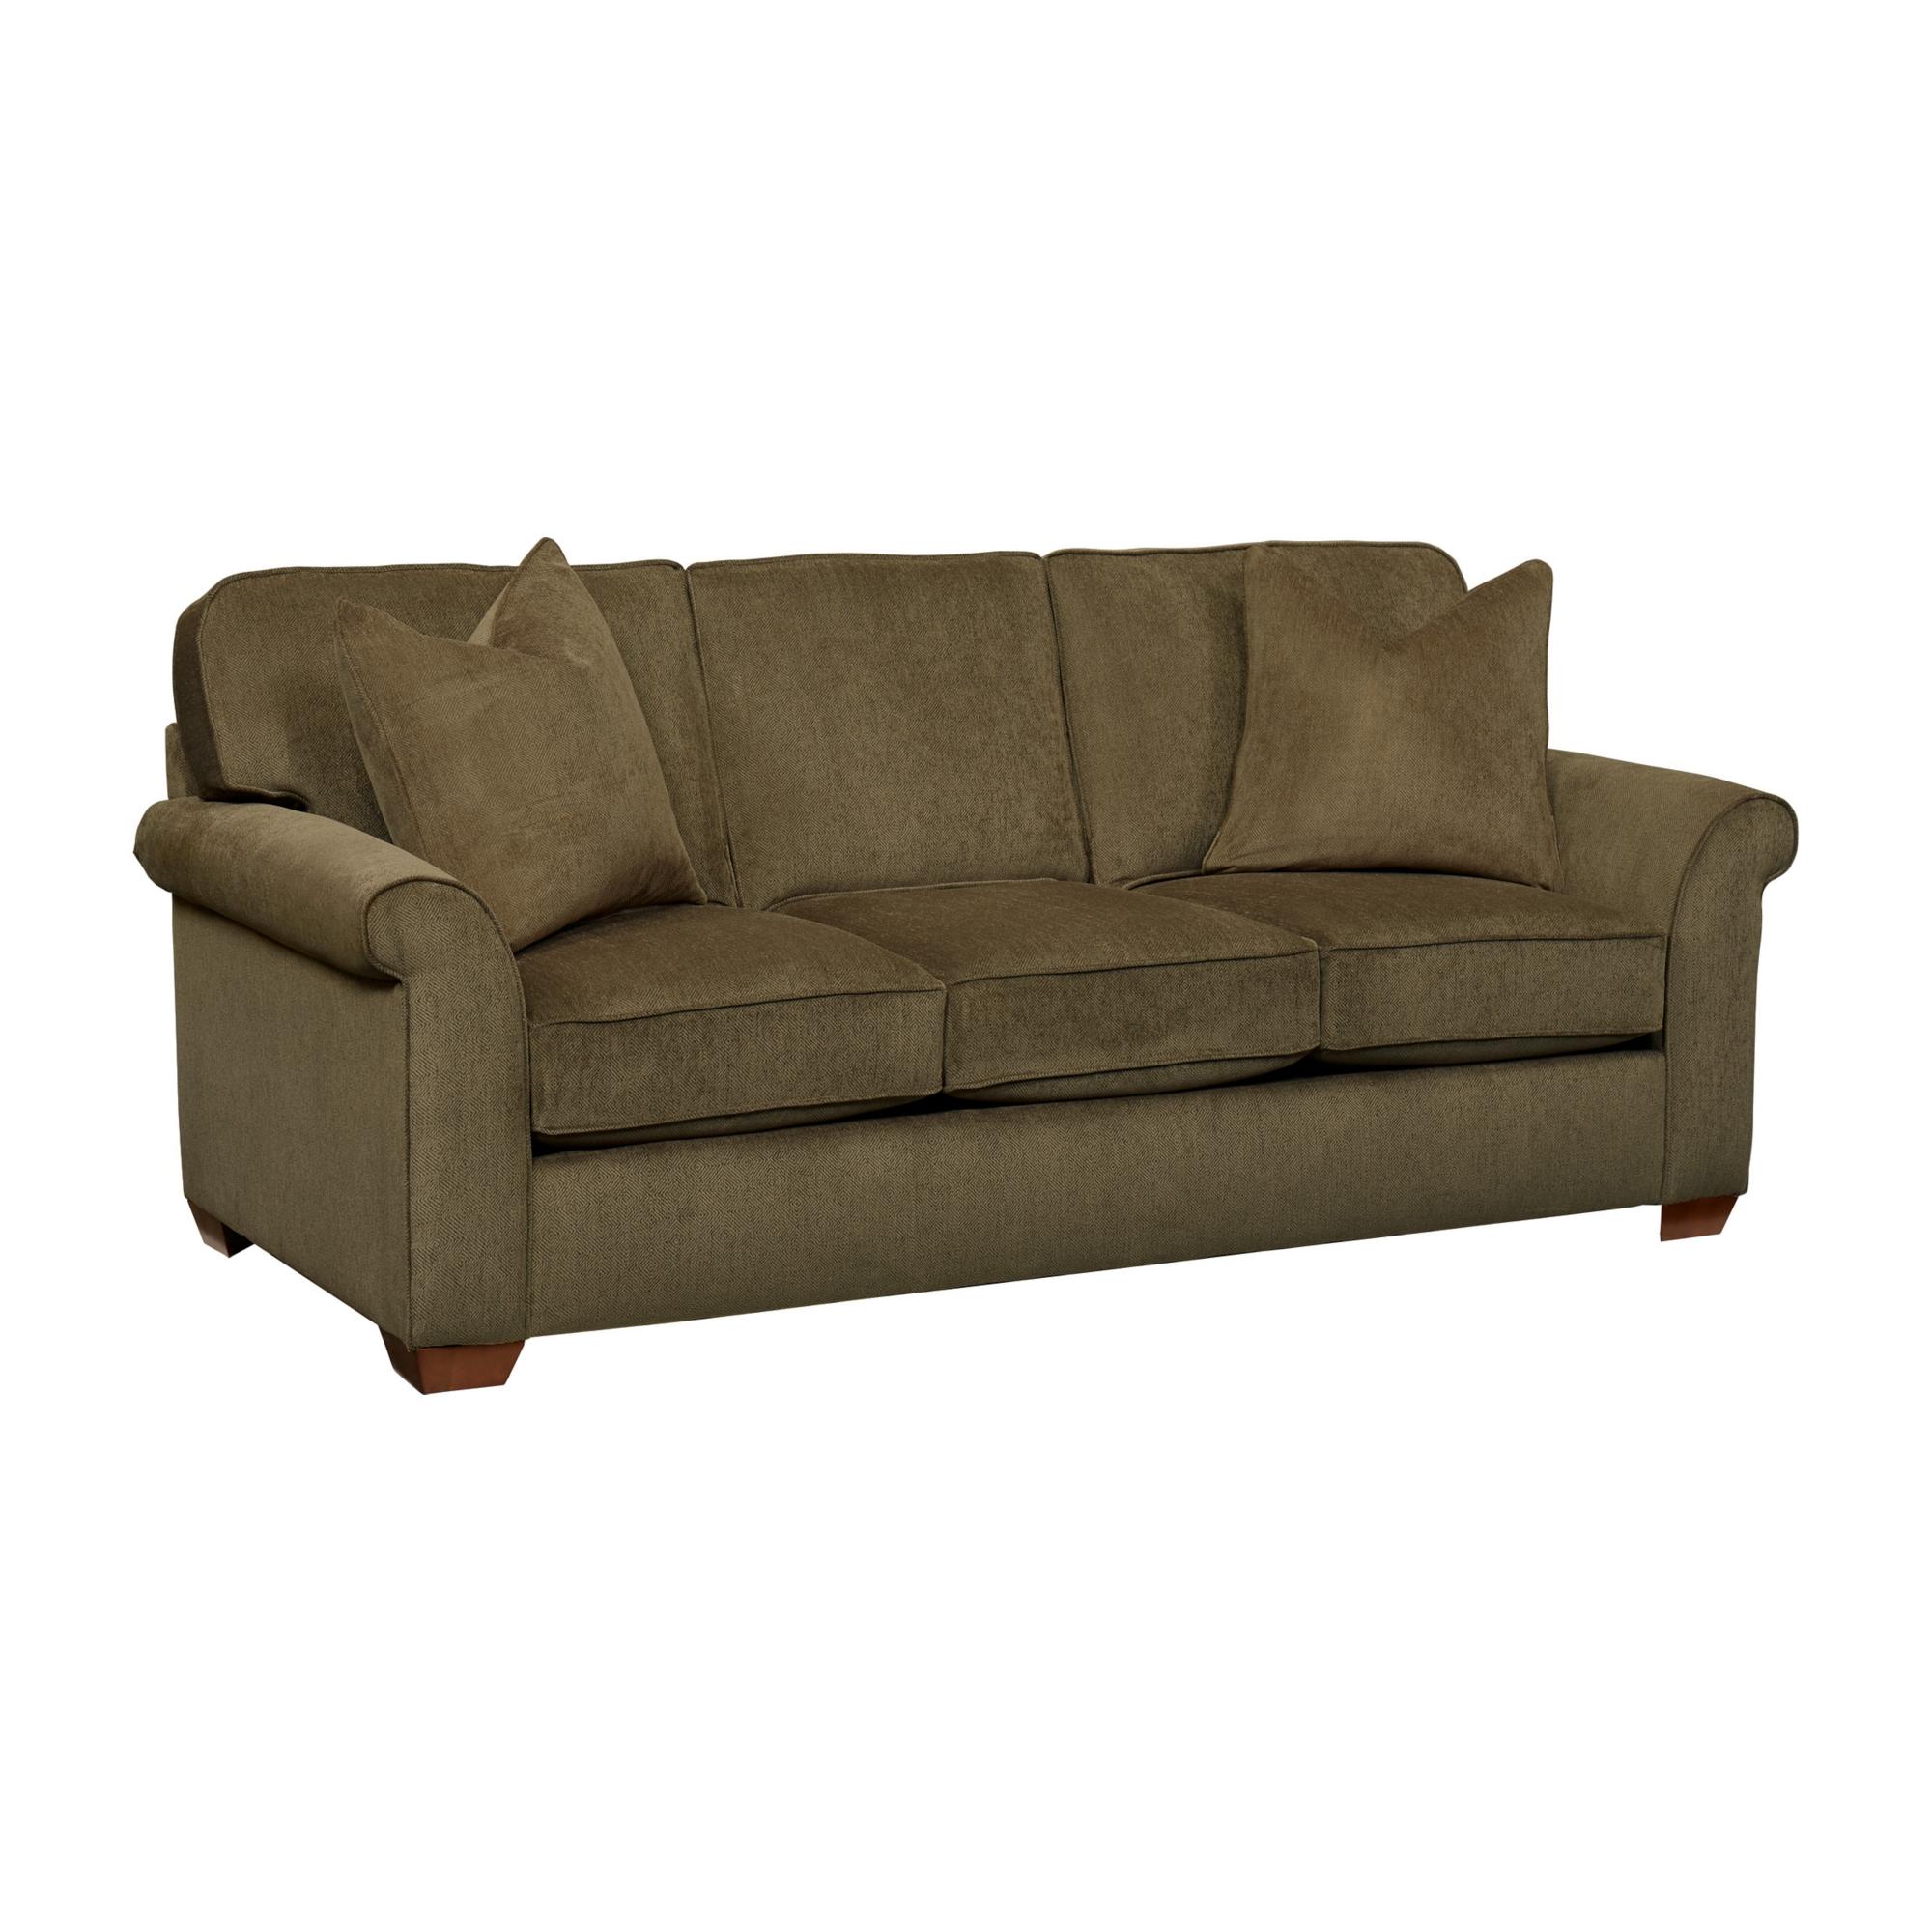 Main Norfolk Sofa Image